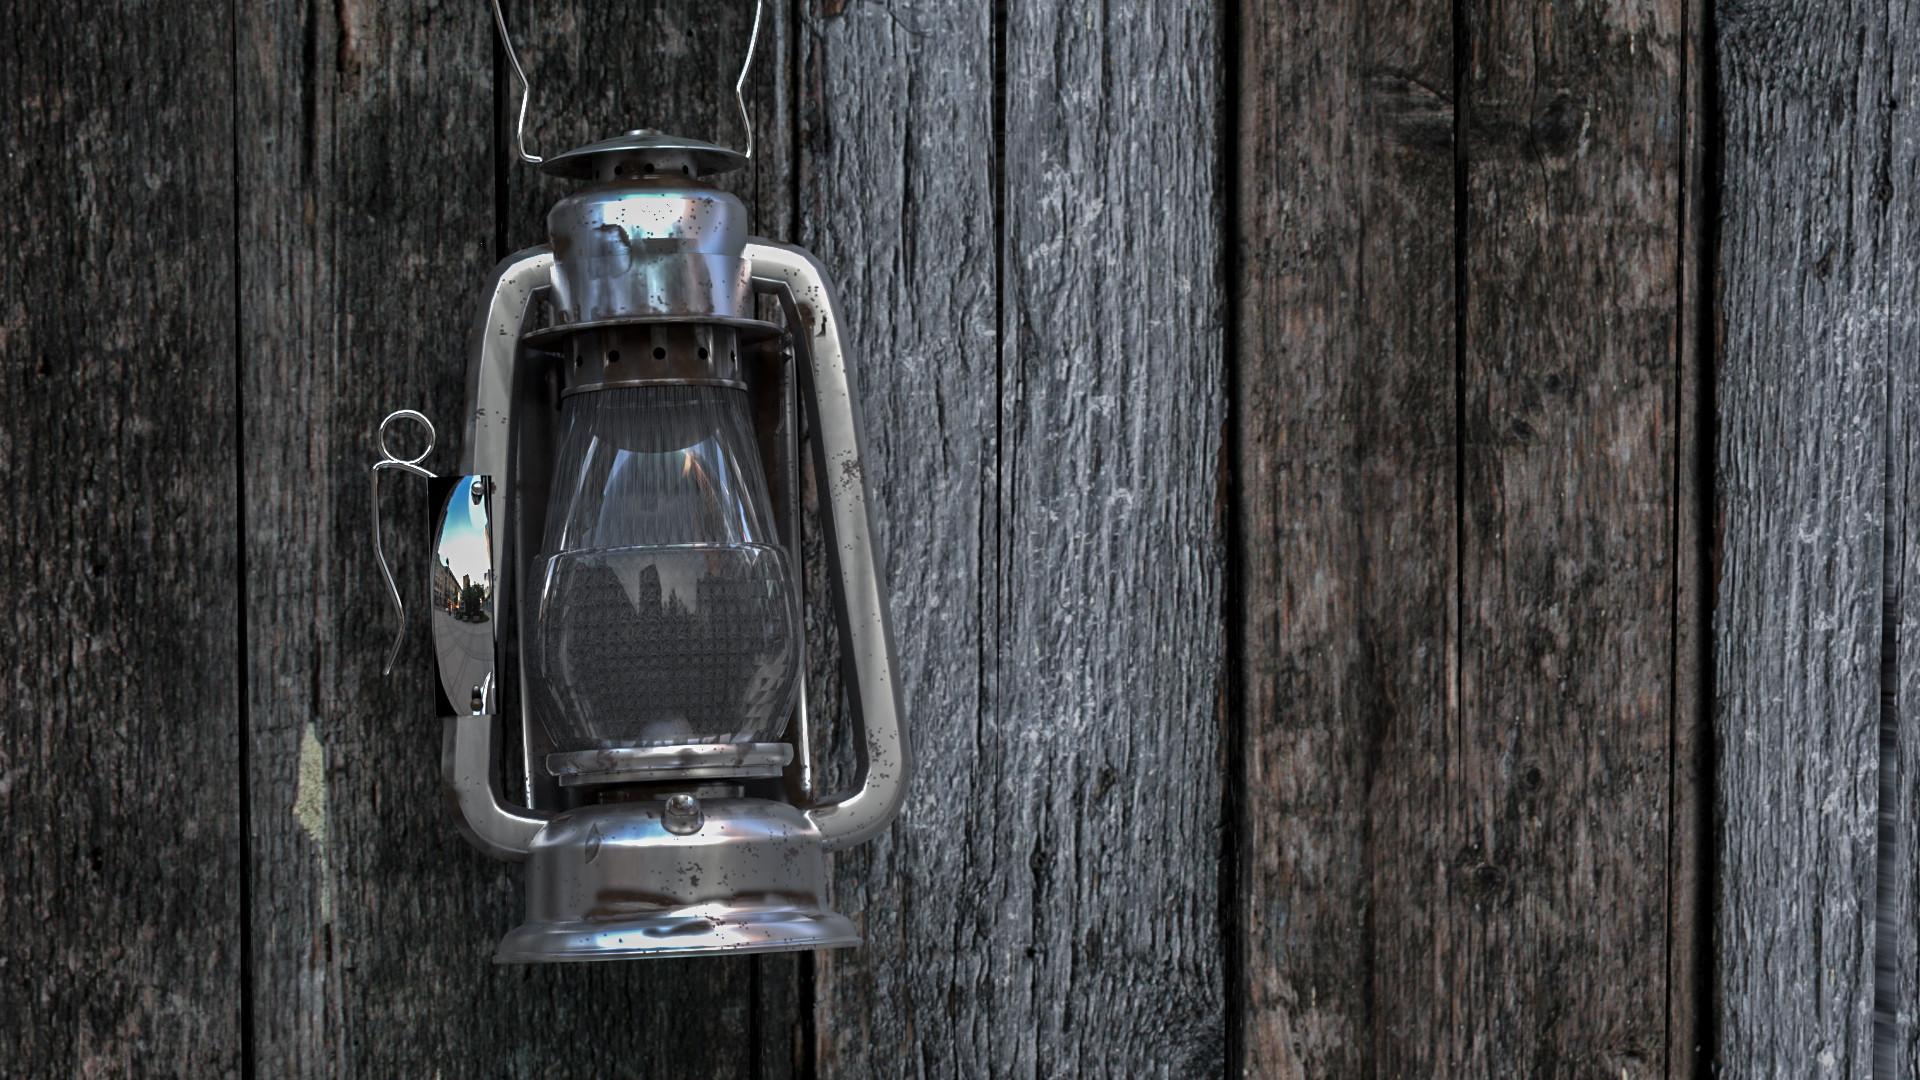 Michelangelo girardi oillamp render3